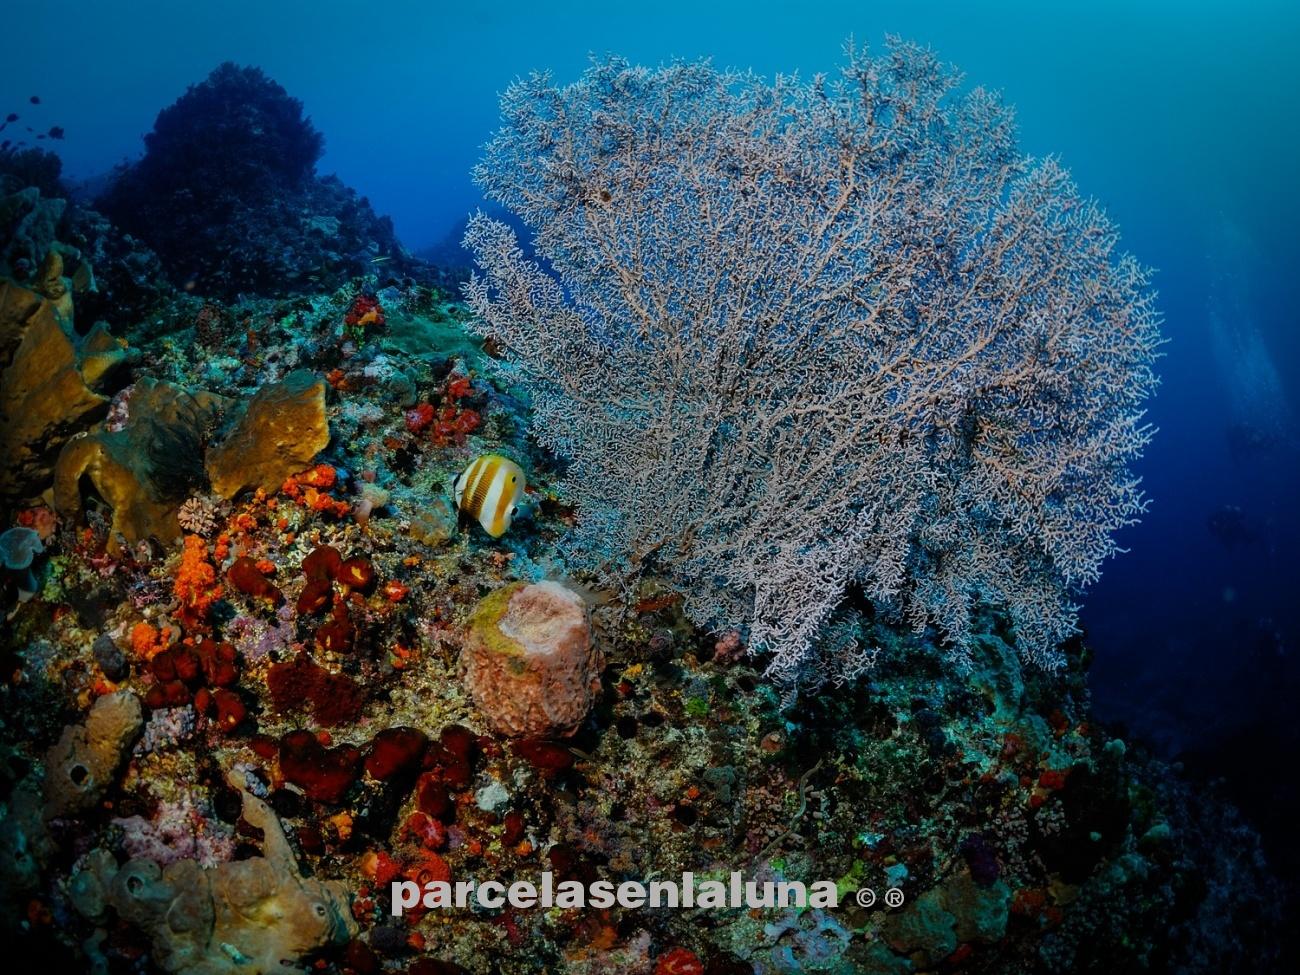 gorgonian maldivas - el fondo del mar - fotosubpasqui-fotografía-submarina-naturaleza-fotosub-dive-buceo-viajar-trip